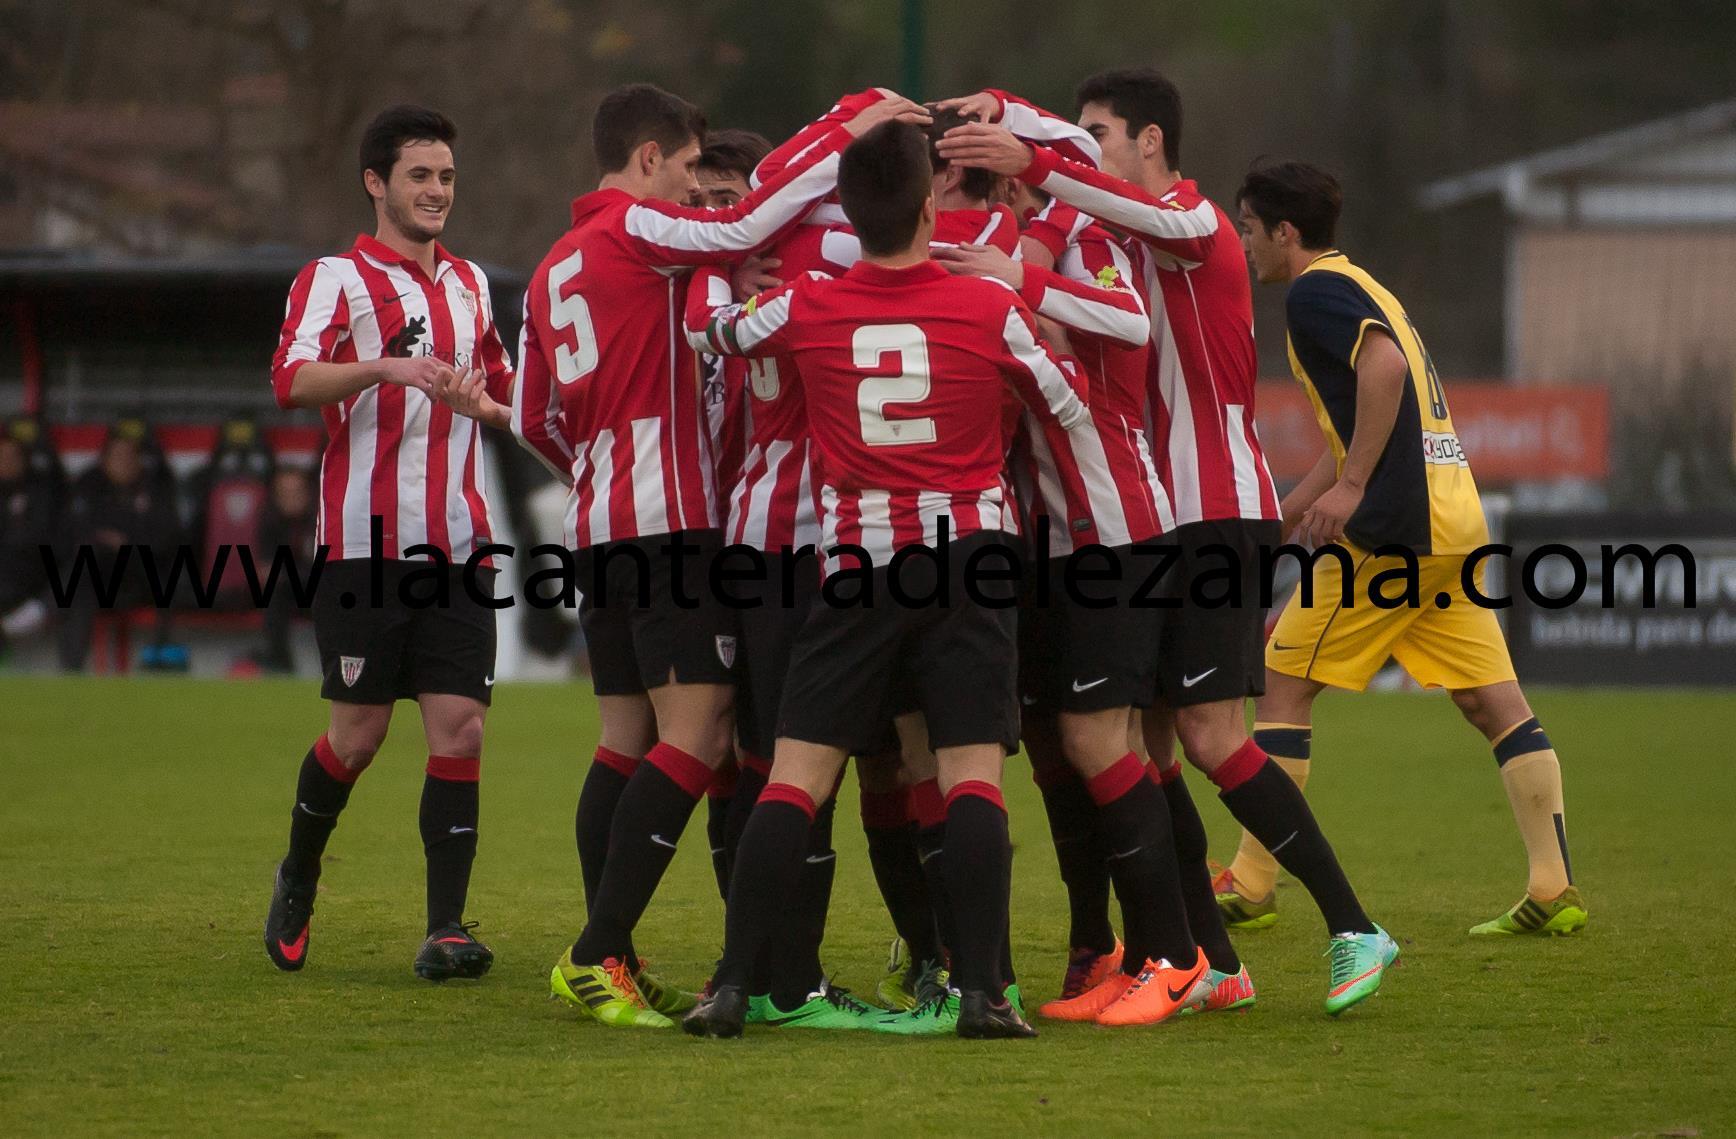 El equipo celebra el gol | Foto: Unai Zabaleta